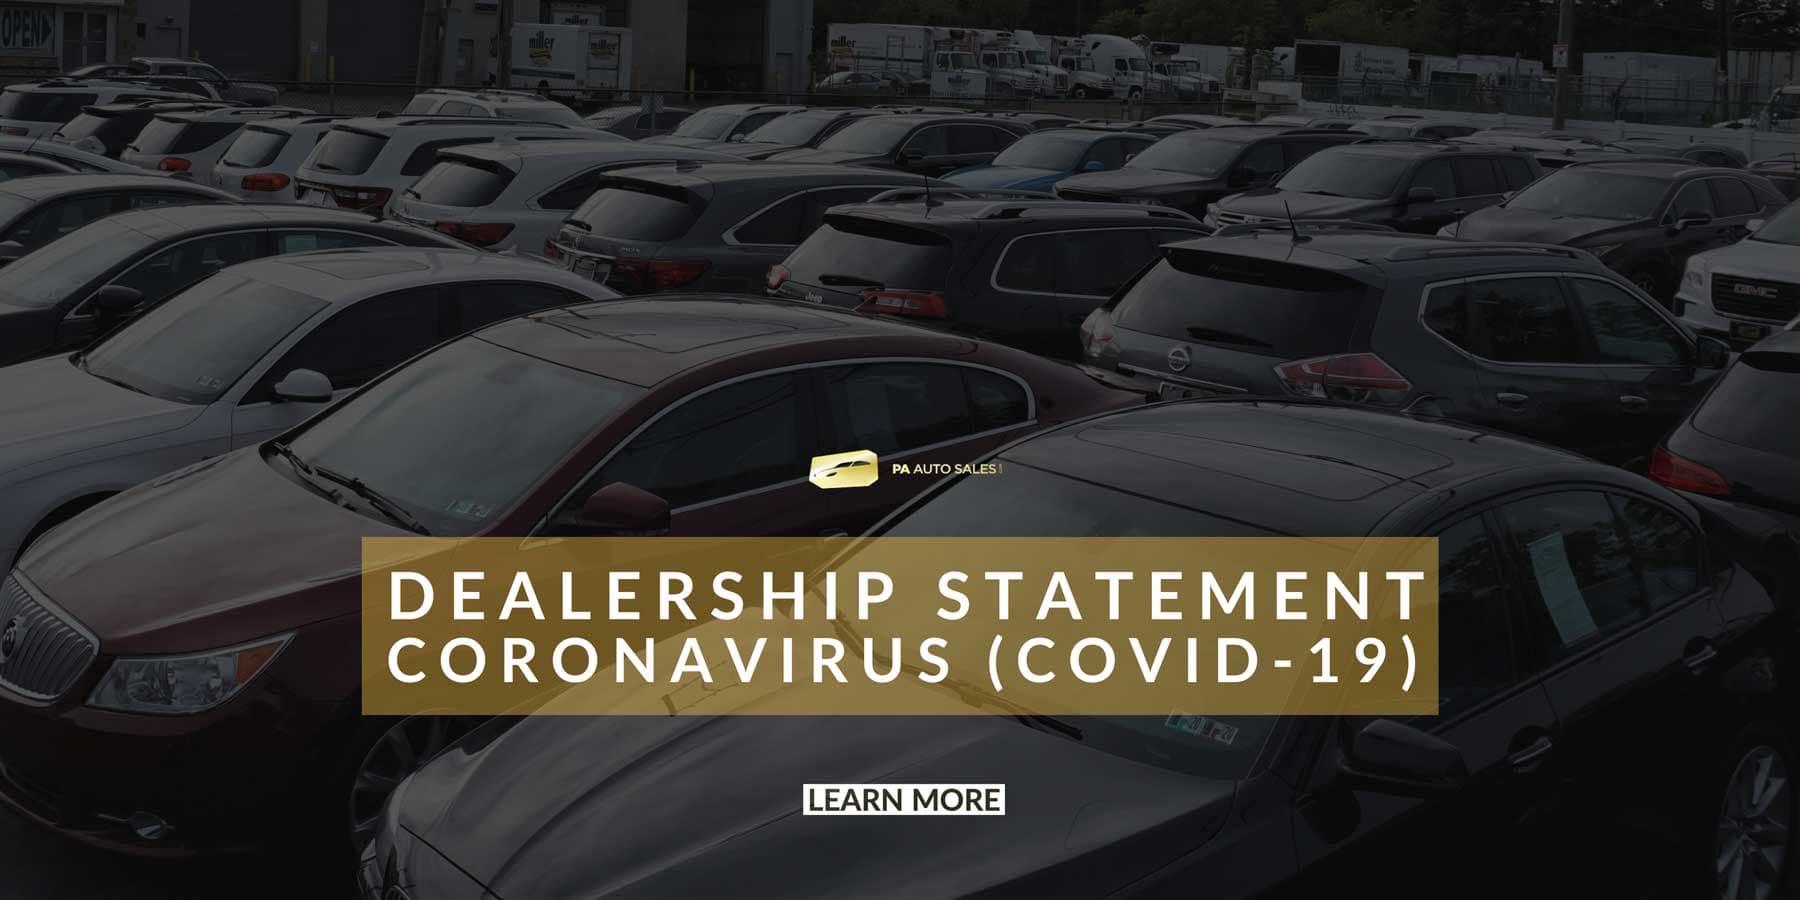 DEALERSHIP STATEMENT Coronavirus (COVID-19)